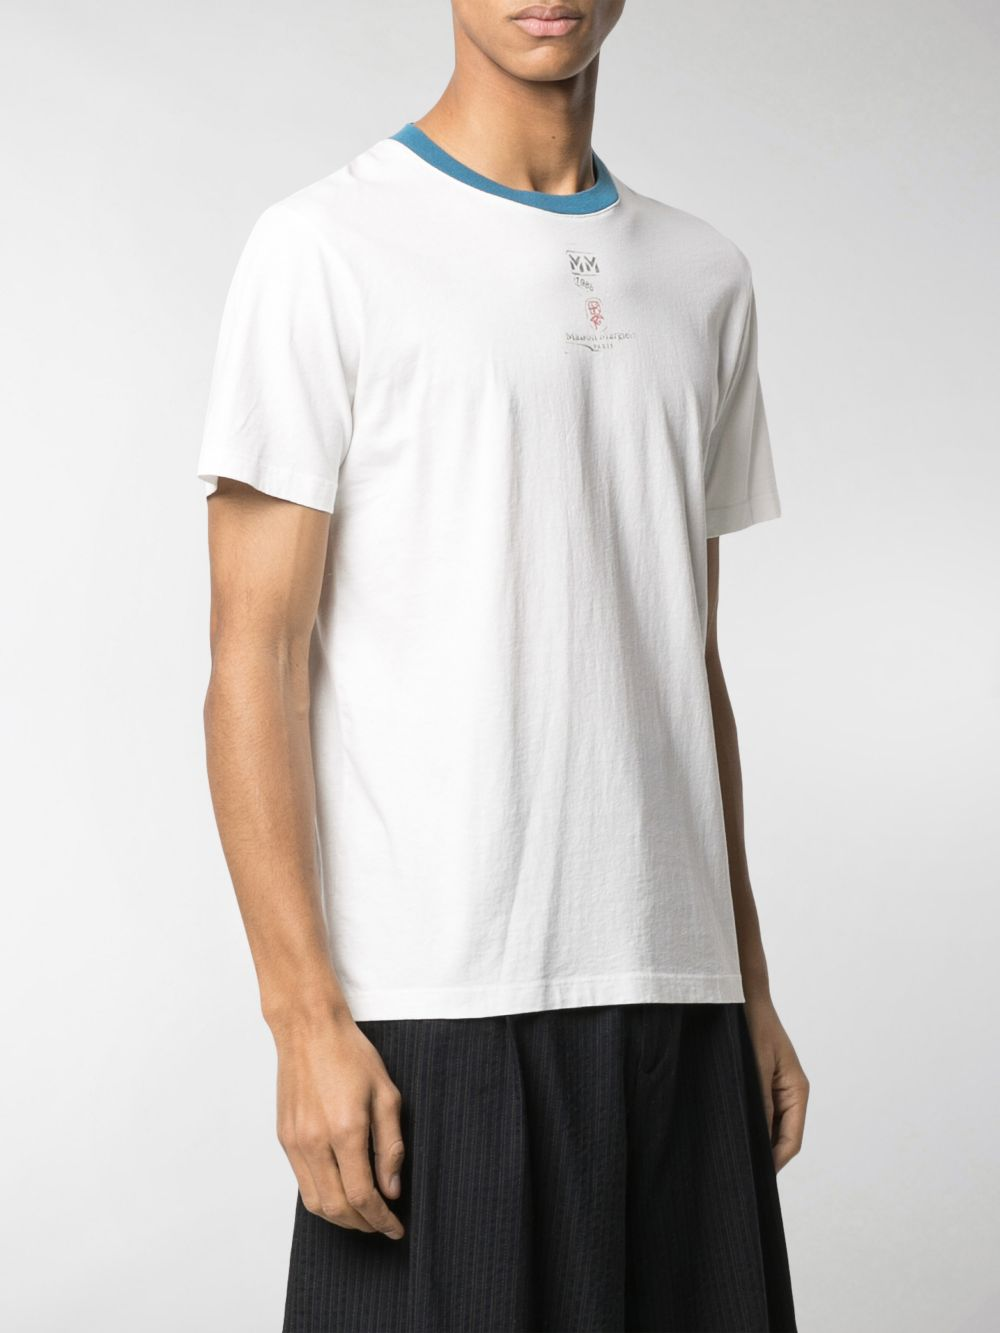 Maison Margiela tripack t-shirt uomo MAISON MARGIELA | T-shirt | S50GC0645 S23909962